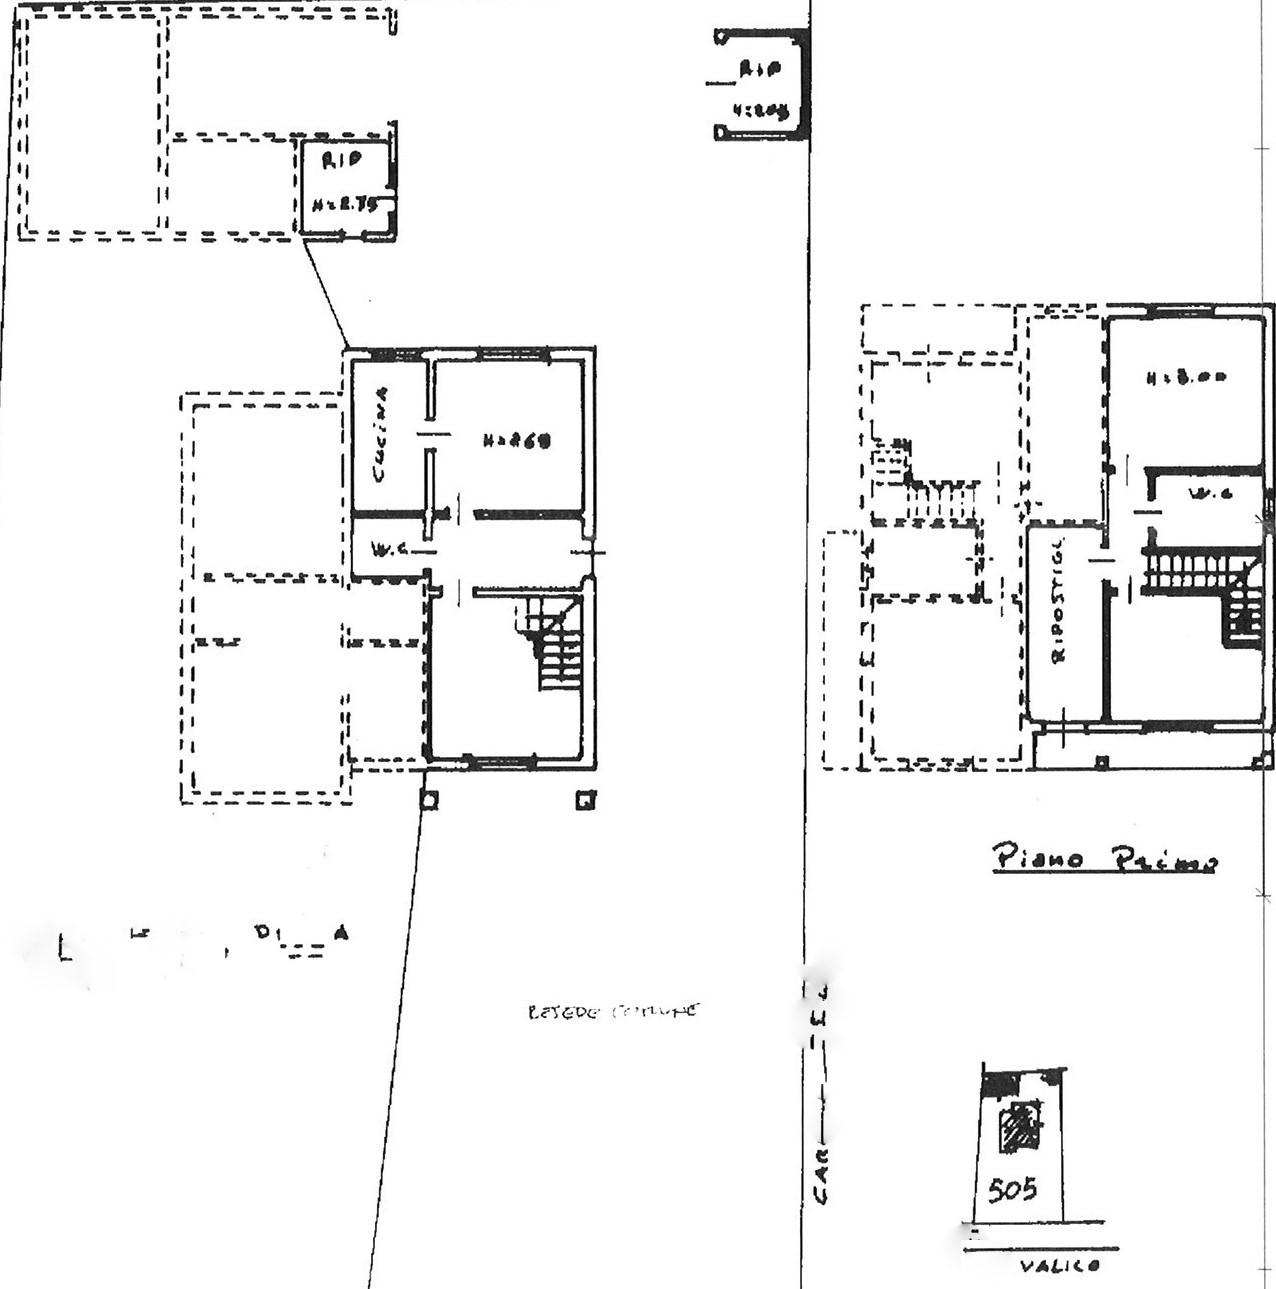 Planimetria 1/1 per rif. vbf altop 170